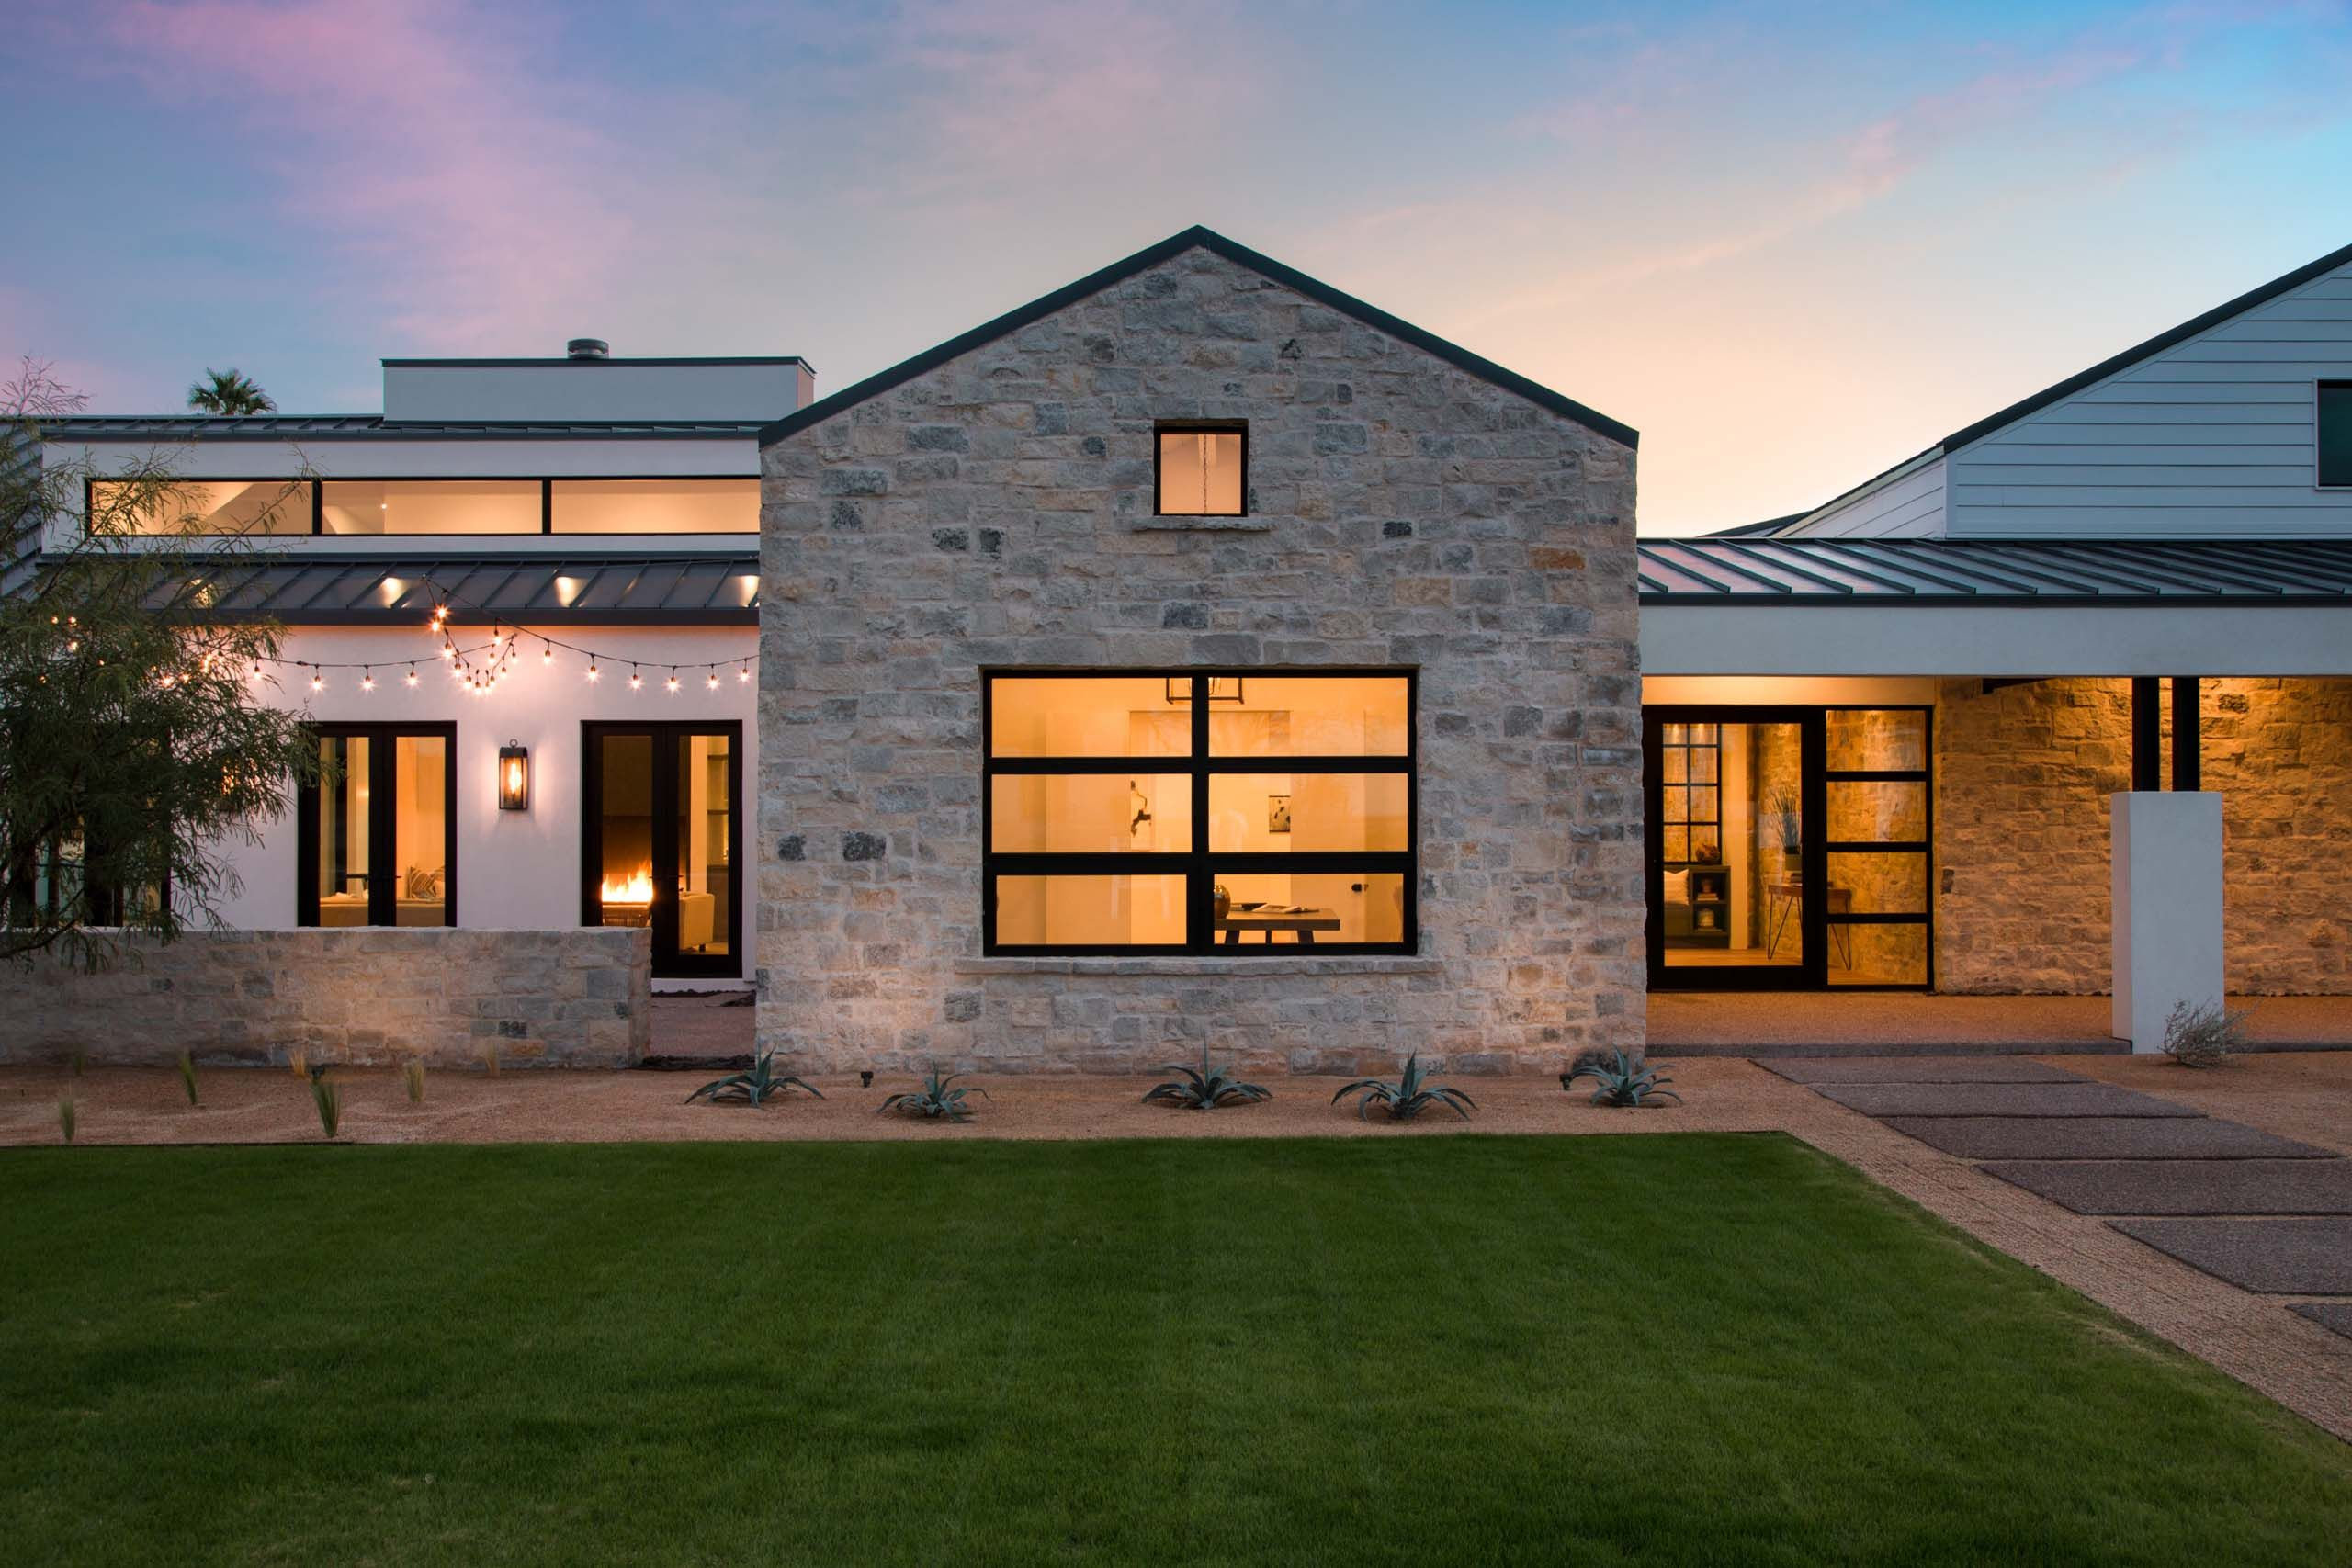 Modern Farmhouse Richard Doria Architecture, K2signature Homes, Studio K  Design